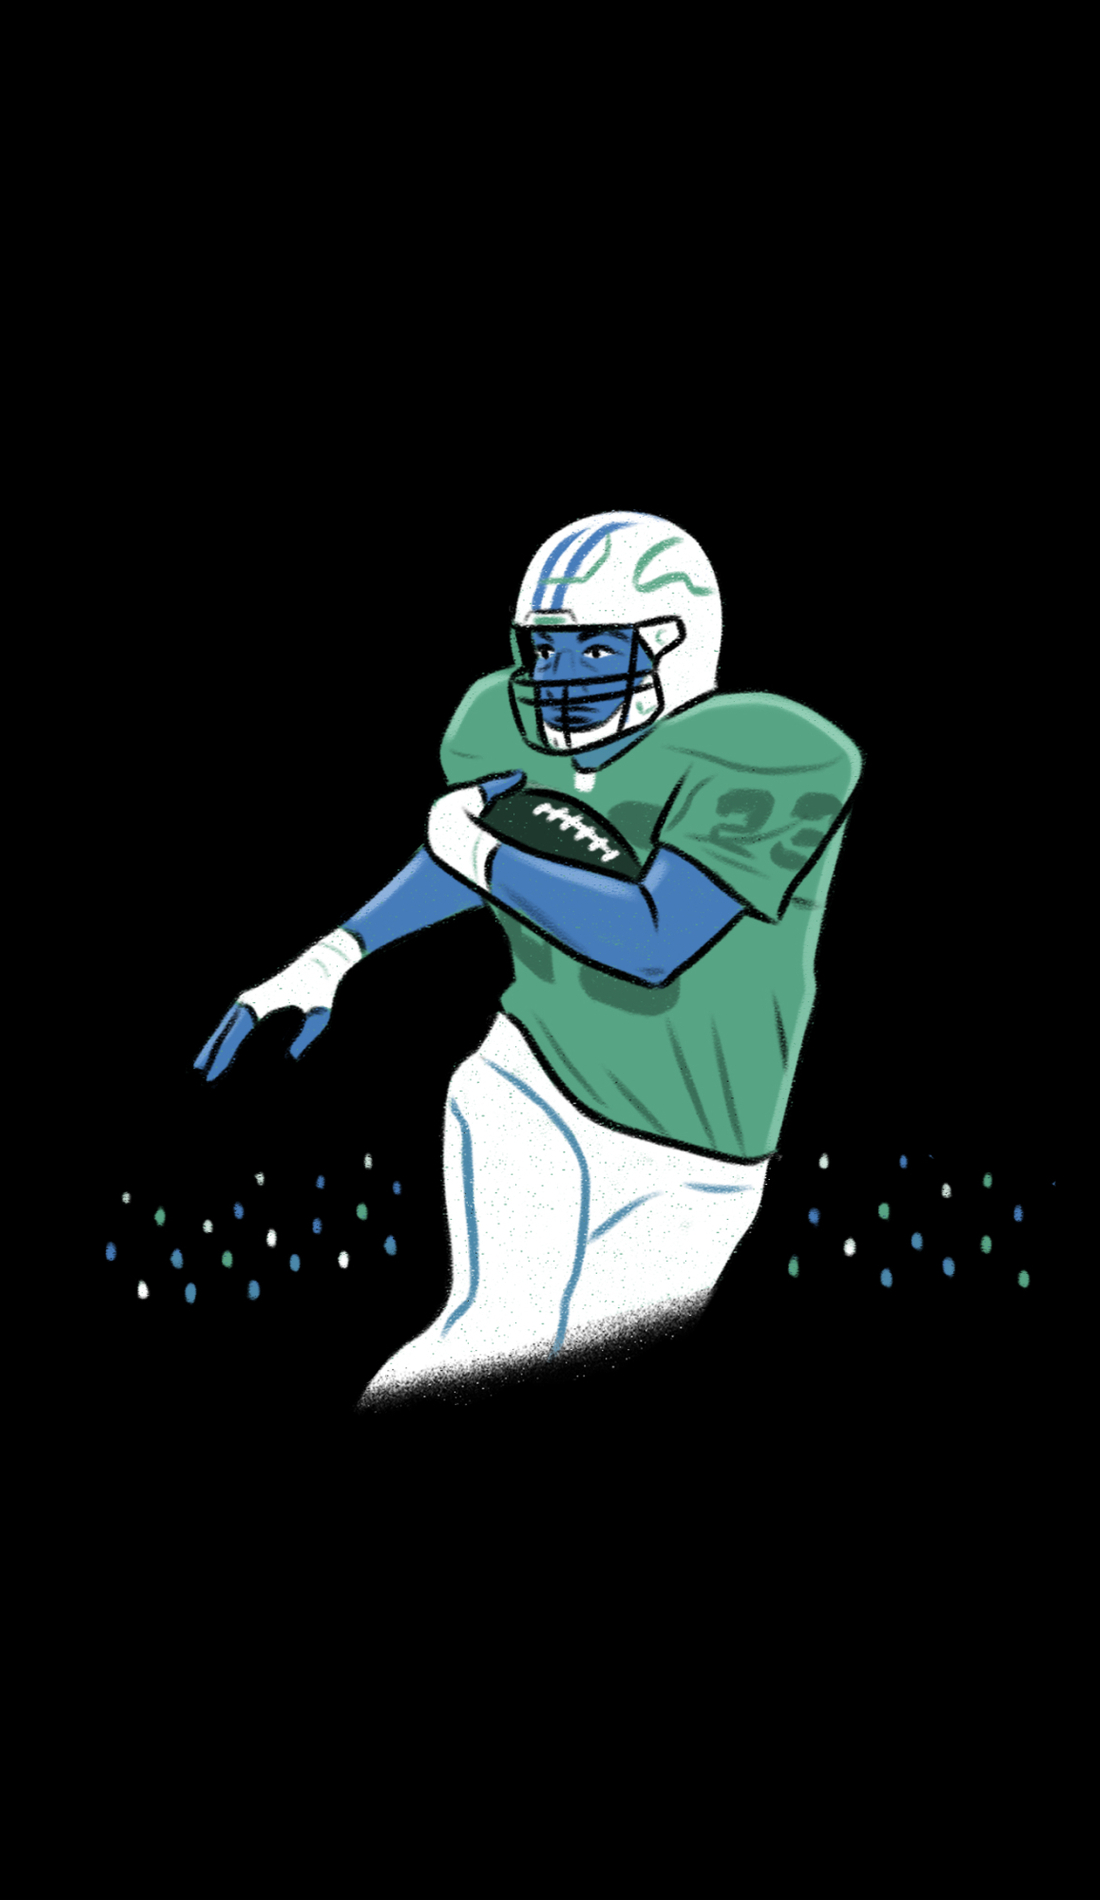 A Southeast Missouri State Redhawks Football live event